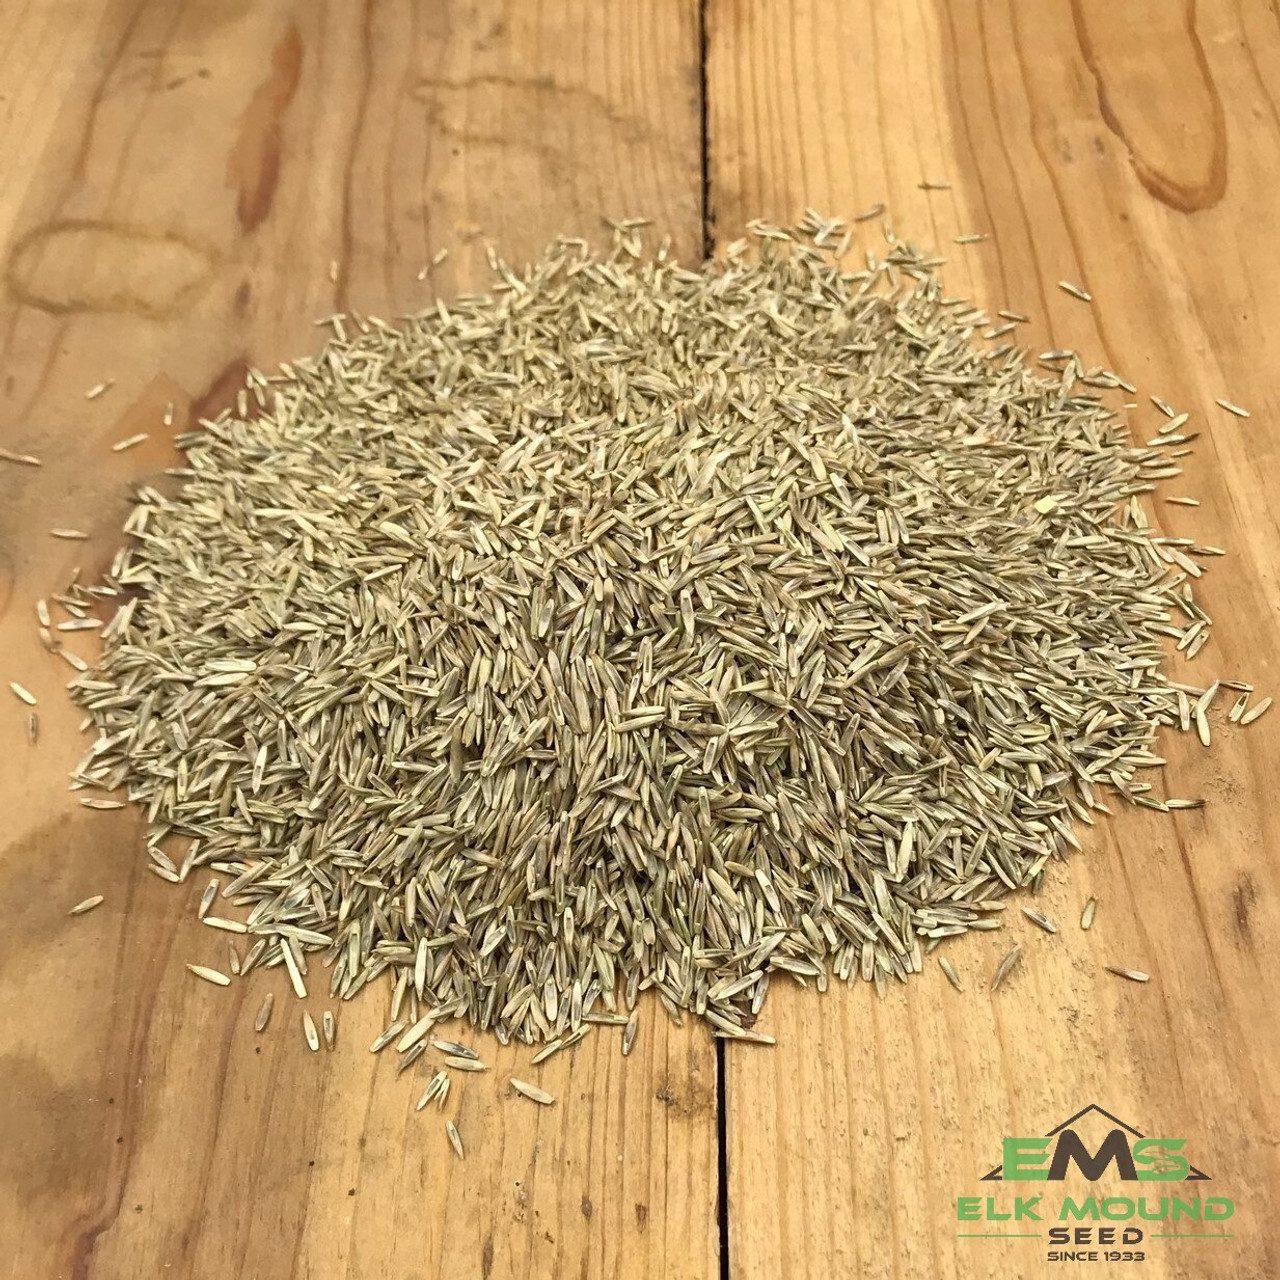 Organic Perennial Ryegrass